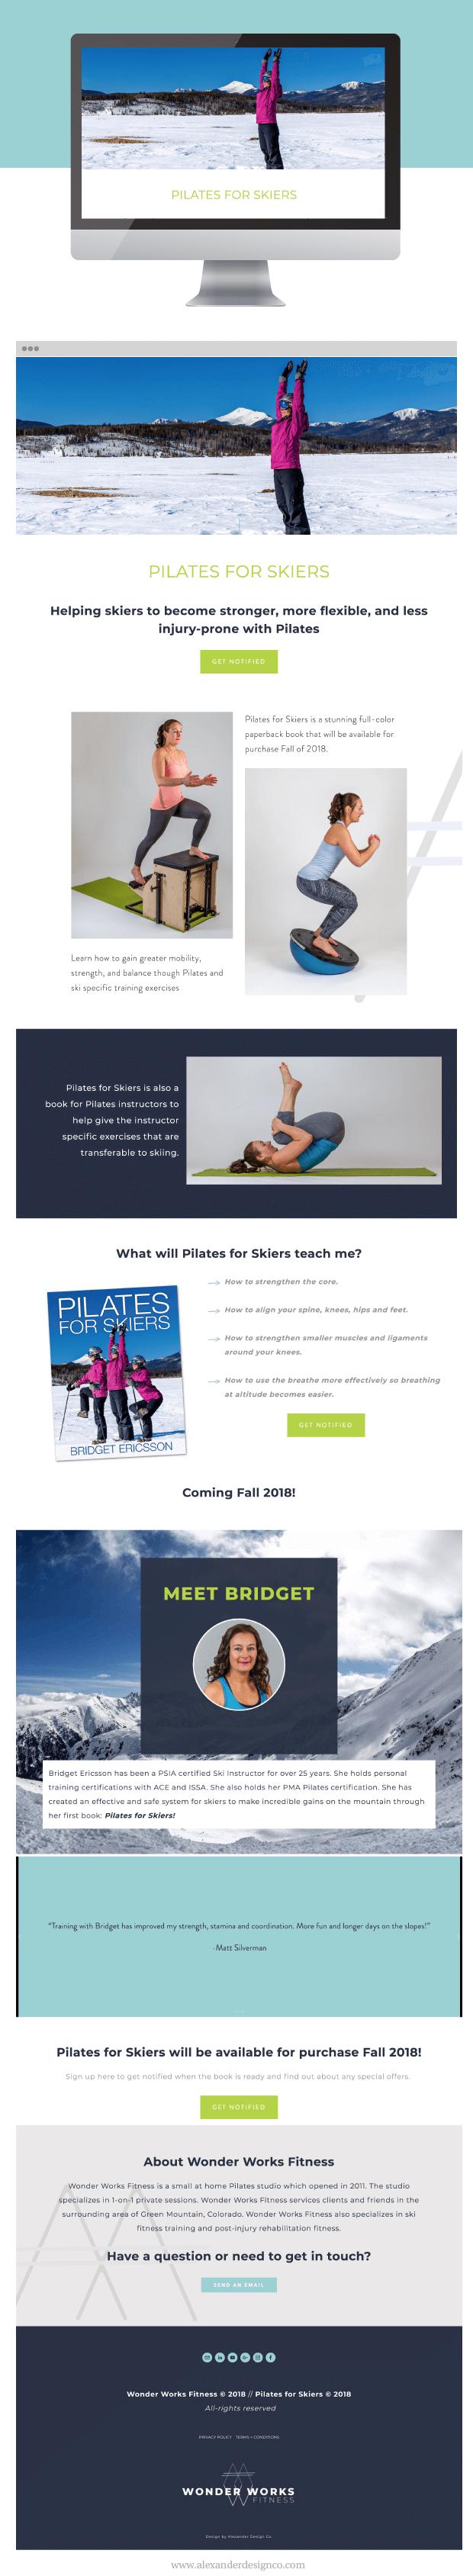 pilatesforskierswebsite_website (1).png